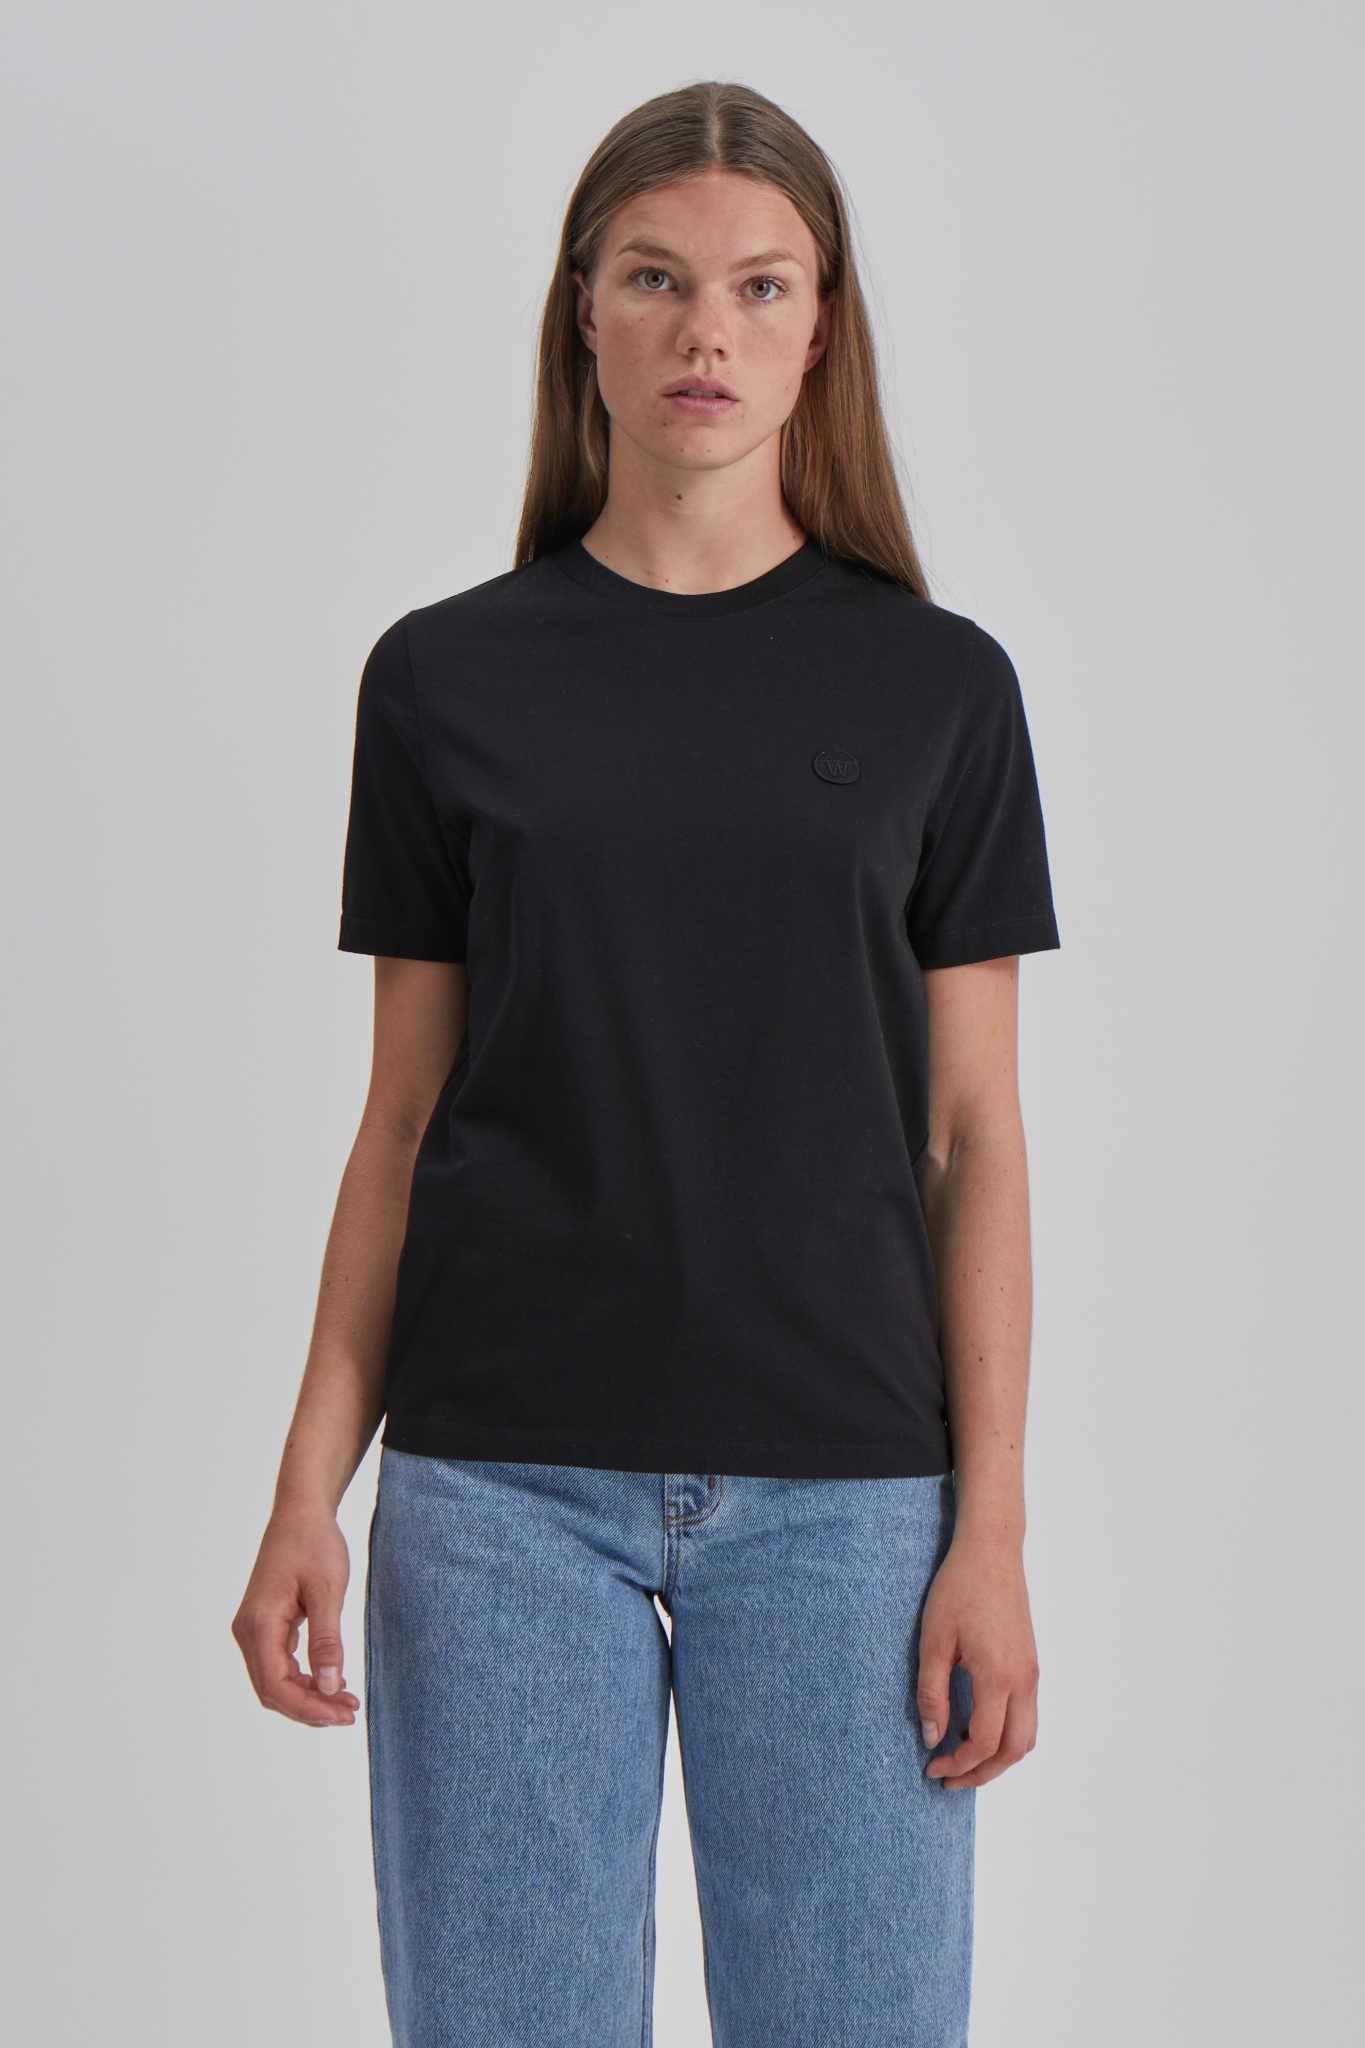 Mia biologisch katoenen zwart T-shirt-2